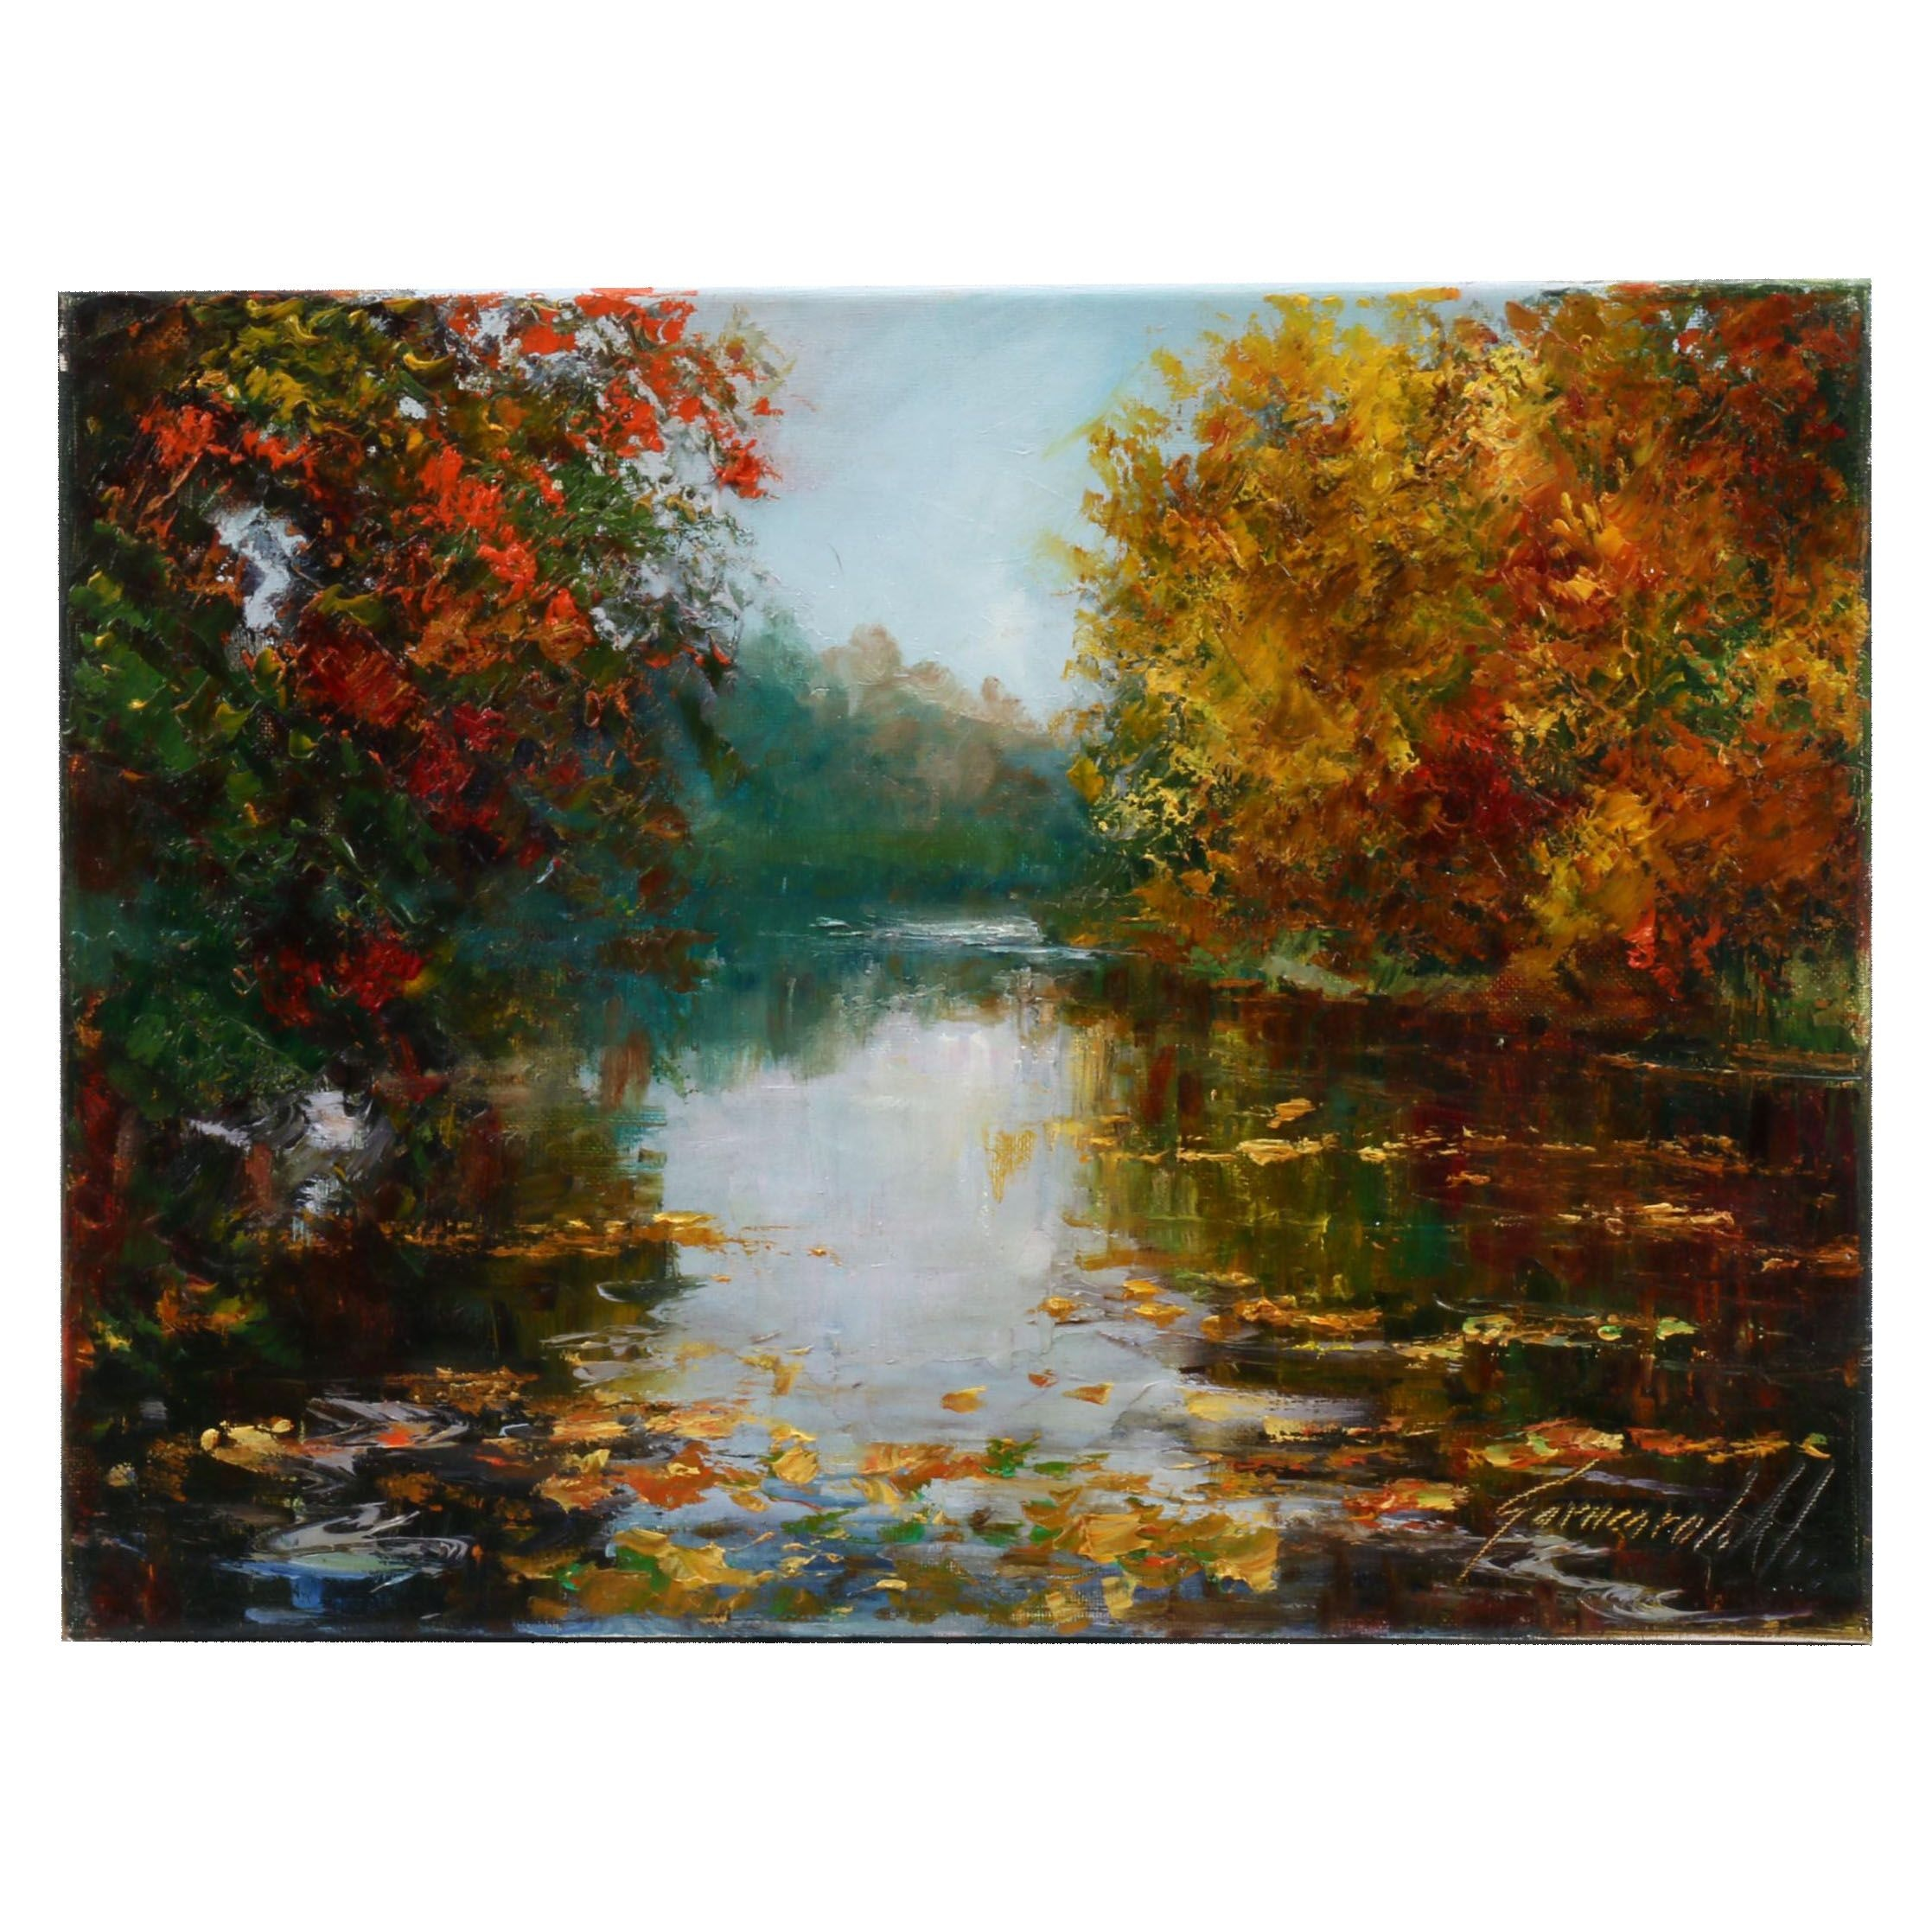 Garncarek Aleksander Landscape Oil Painting